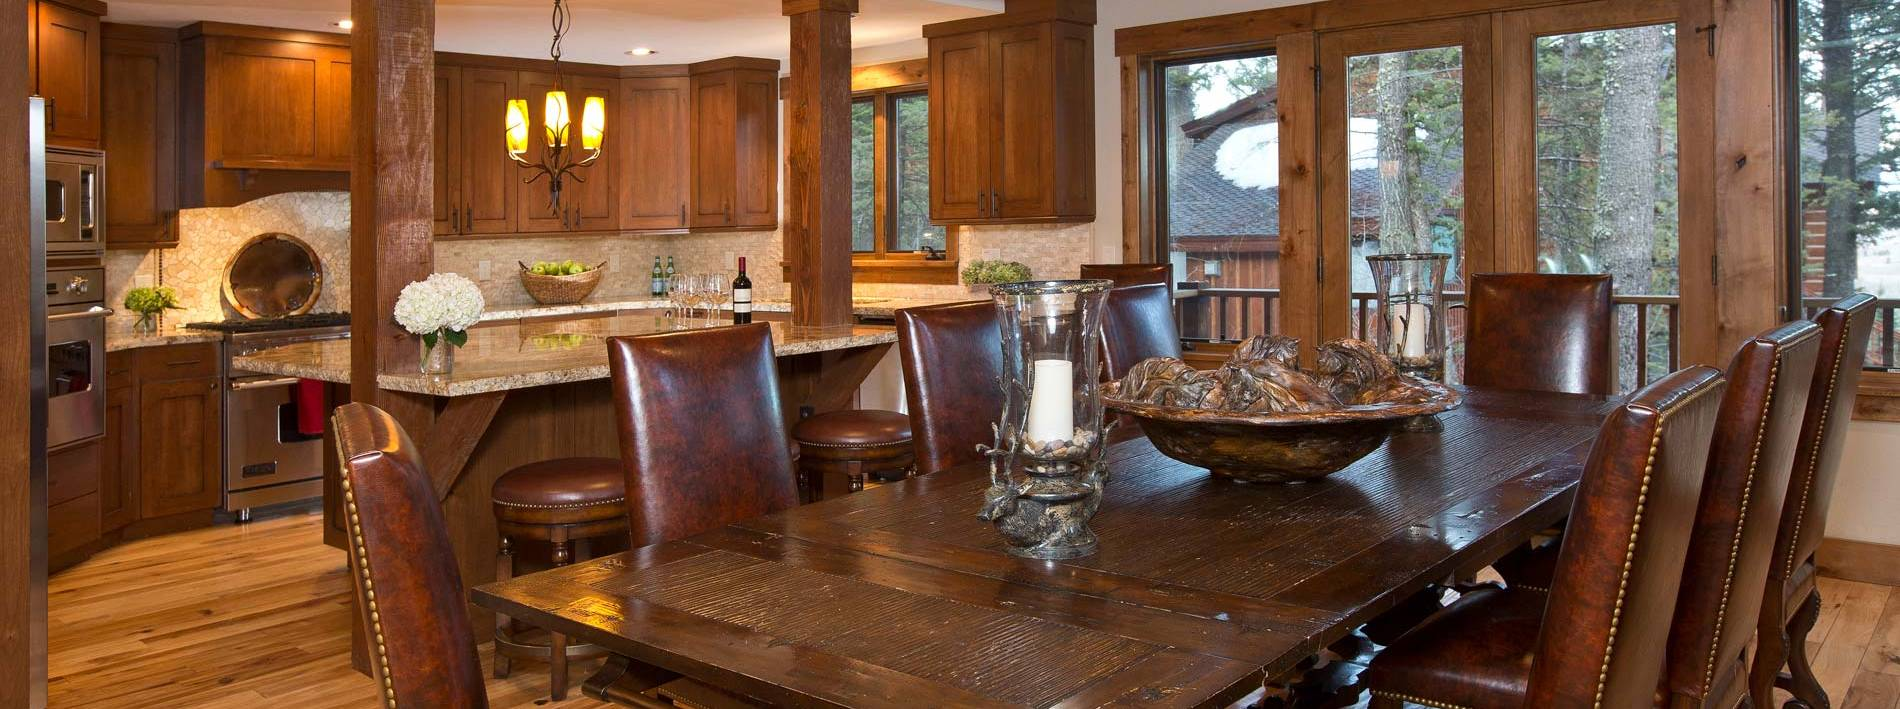 Jackson Hole Blue Moose lodge kitchen table